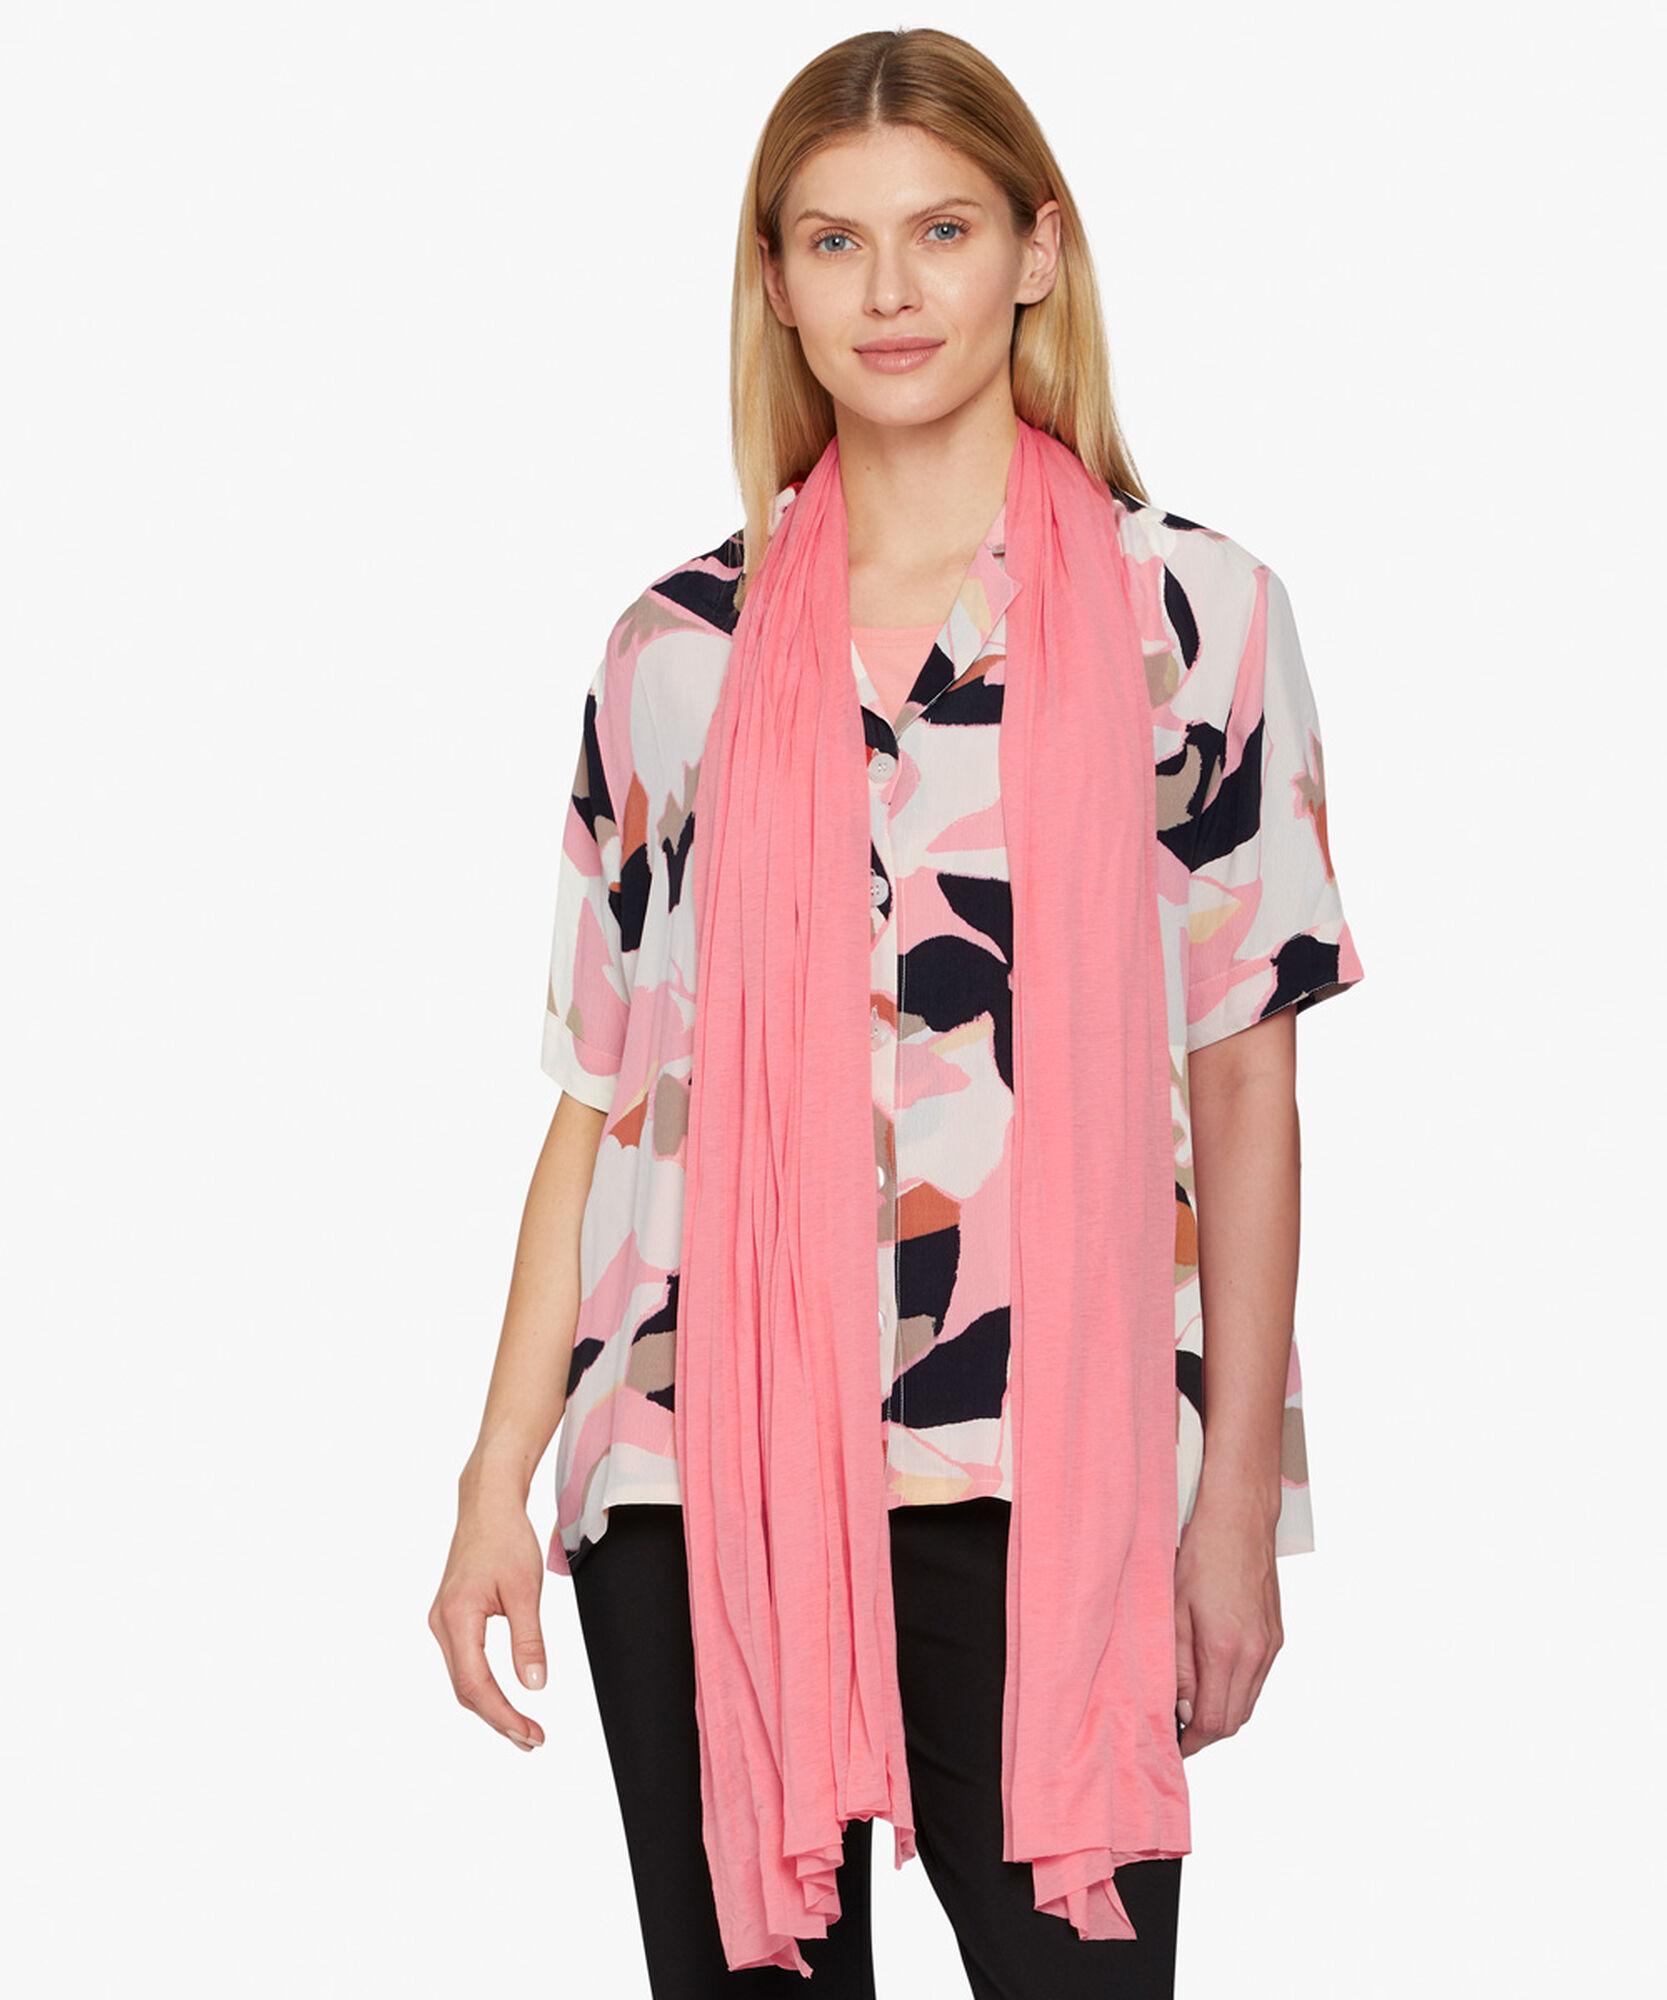 AMEGA JERSEY TUCH, Peach Blossom, hi-res